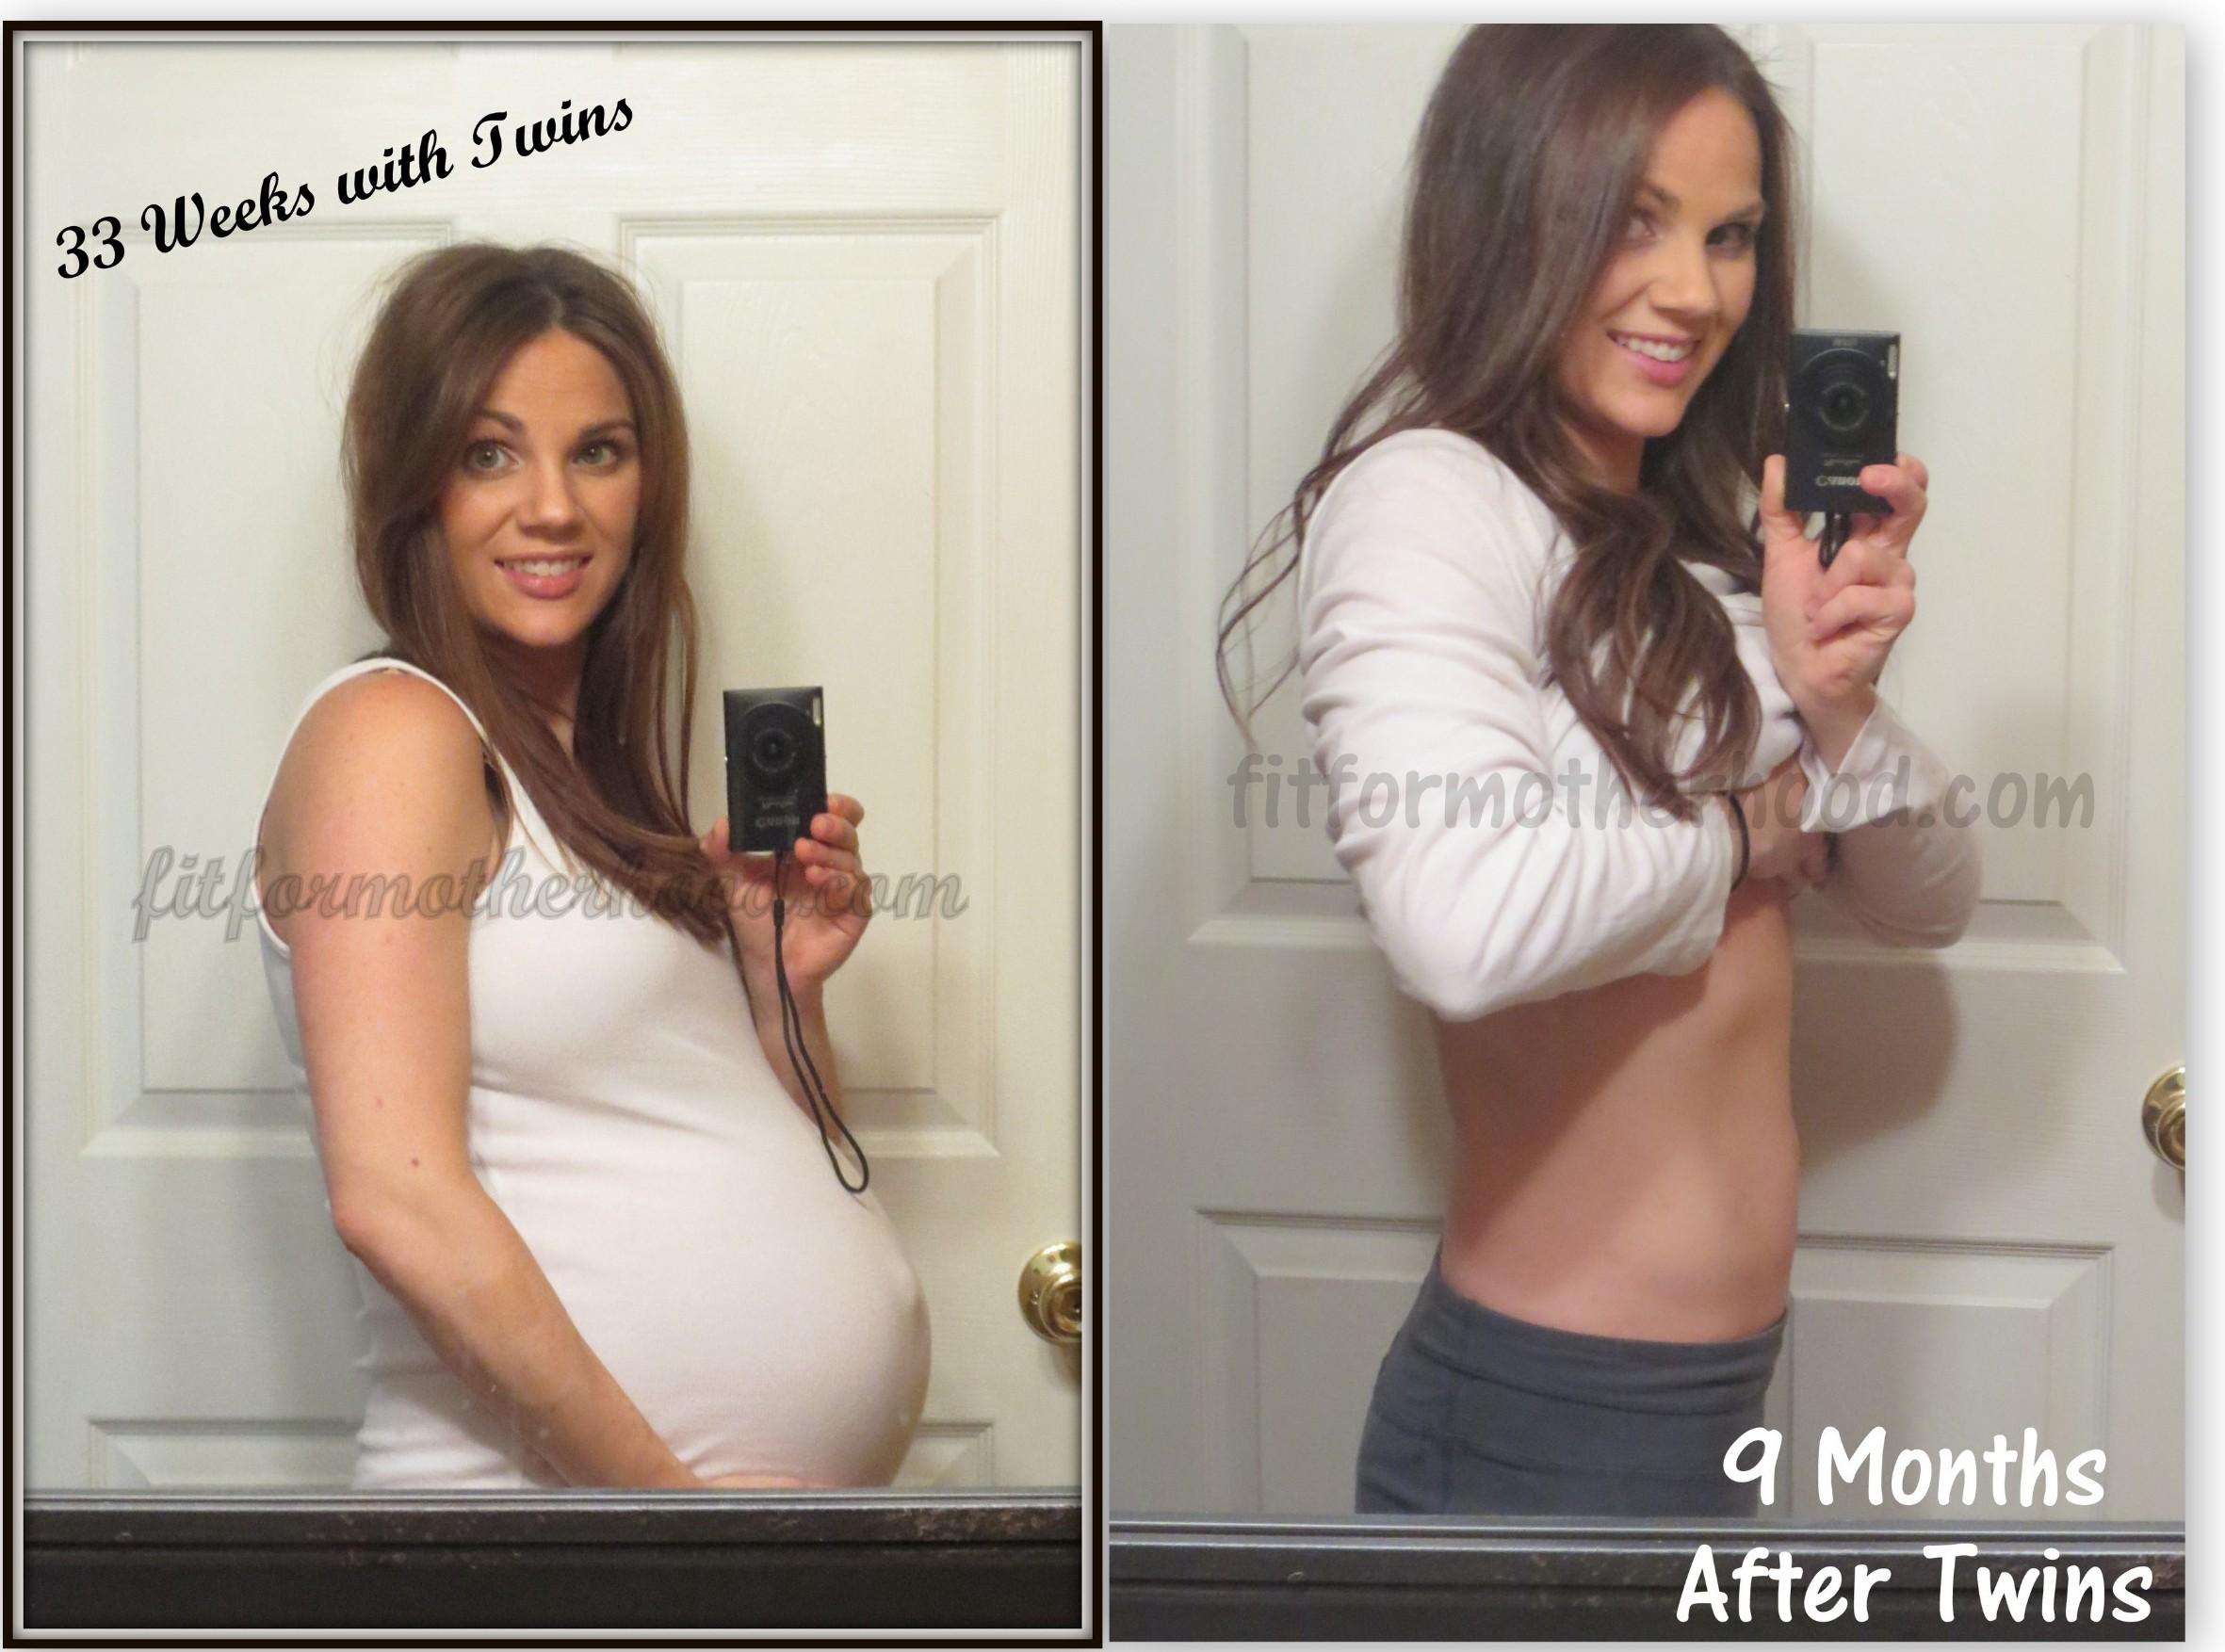 9 Months Postpartum (After Twins)